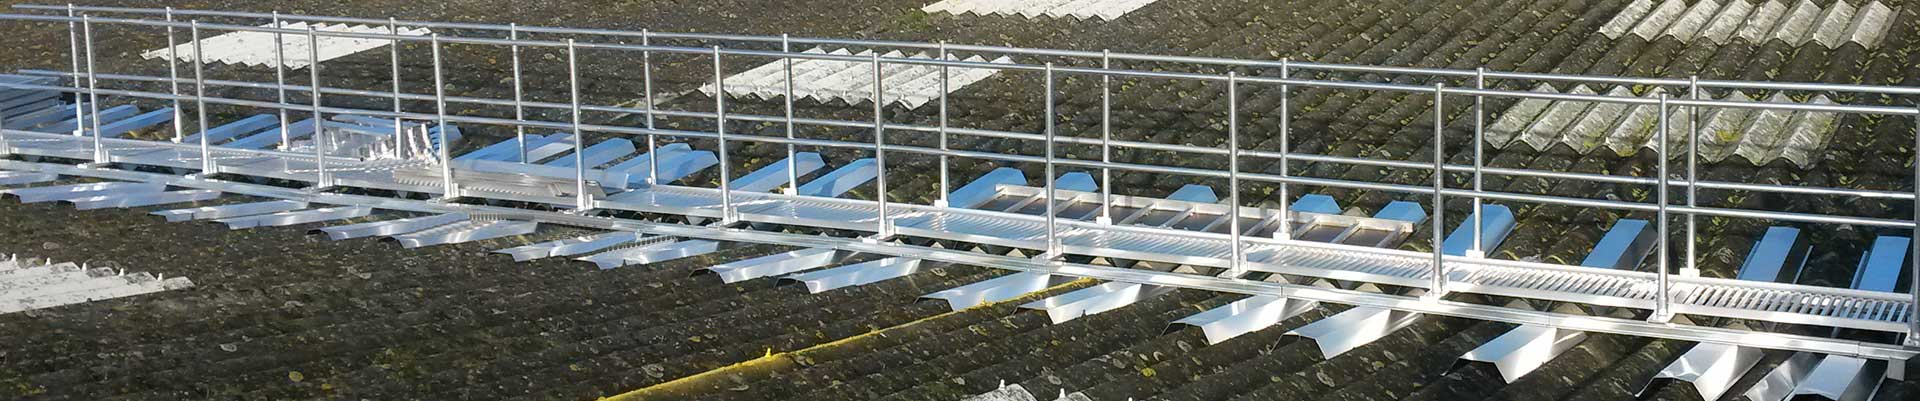 roofing walkway